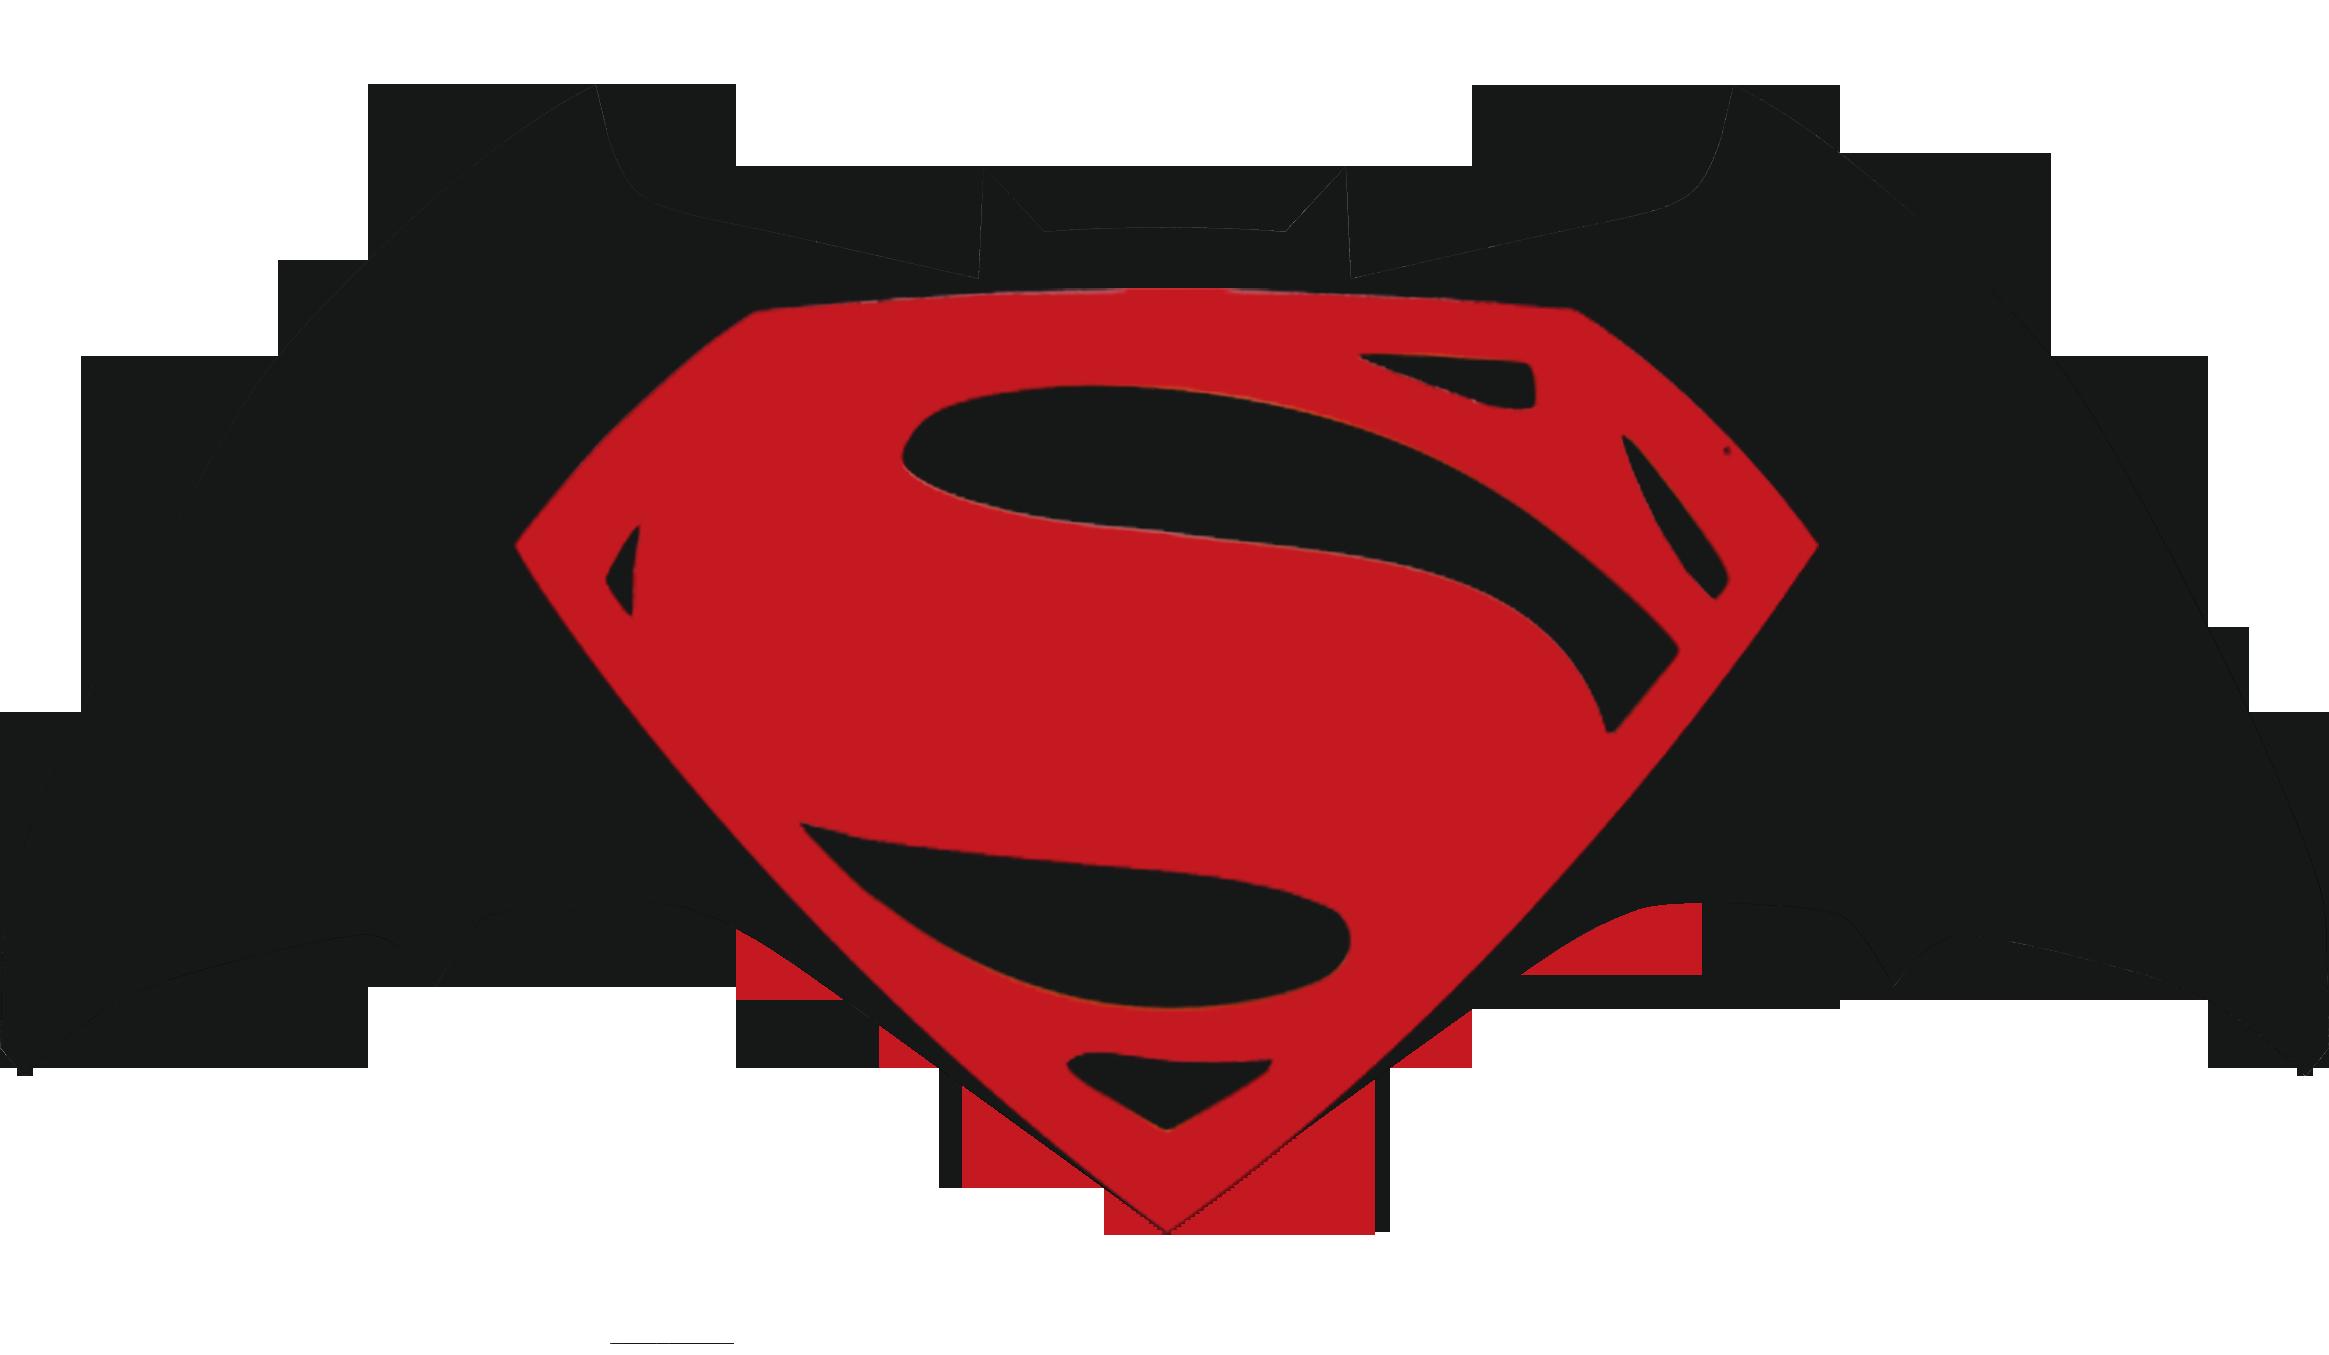 2329x1355 Batman V Superman Logo Minimalist By Movies Of Yalli